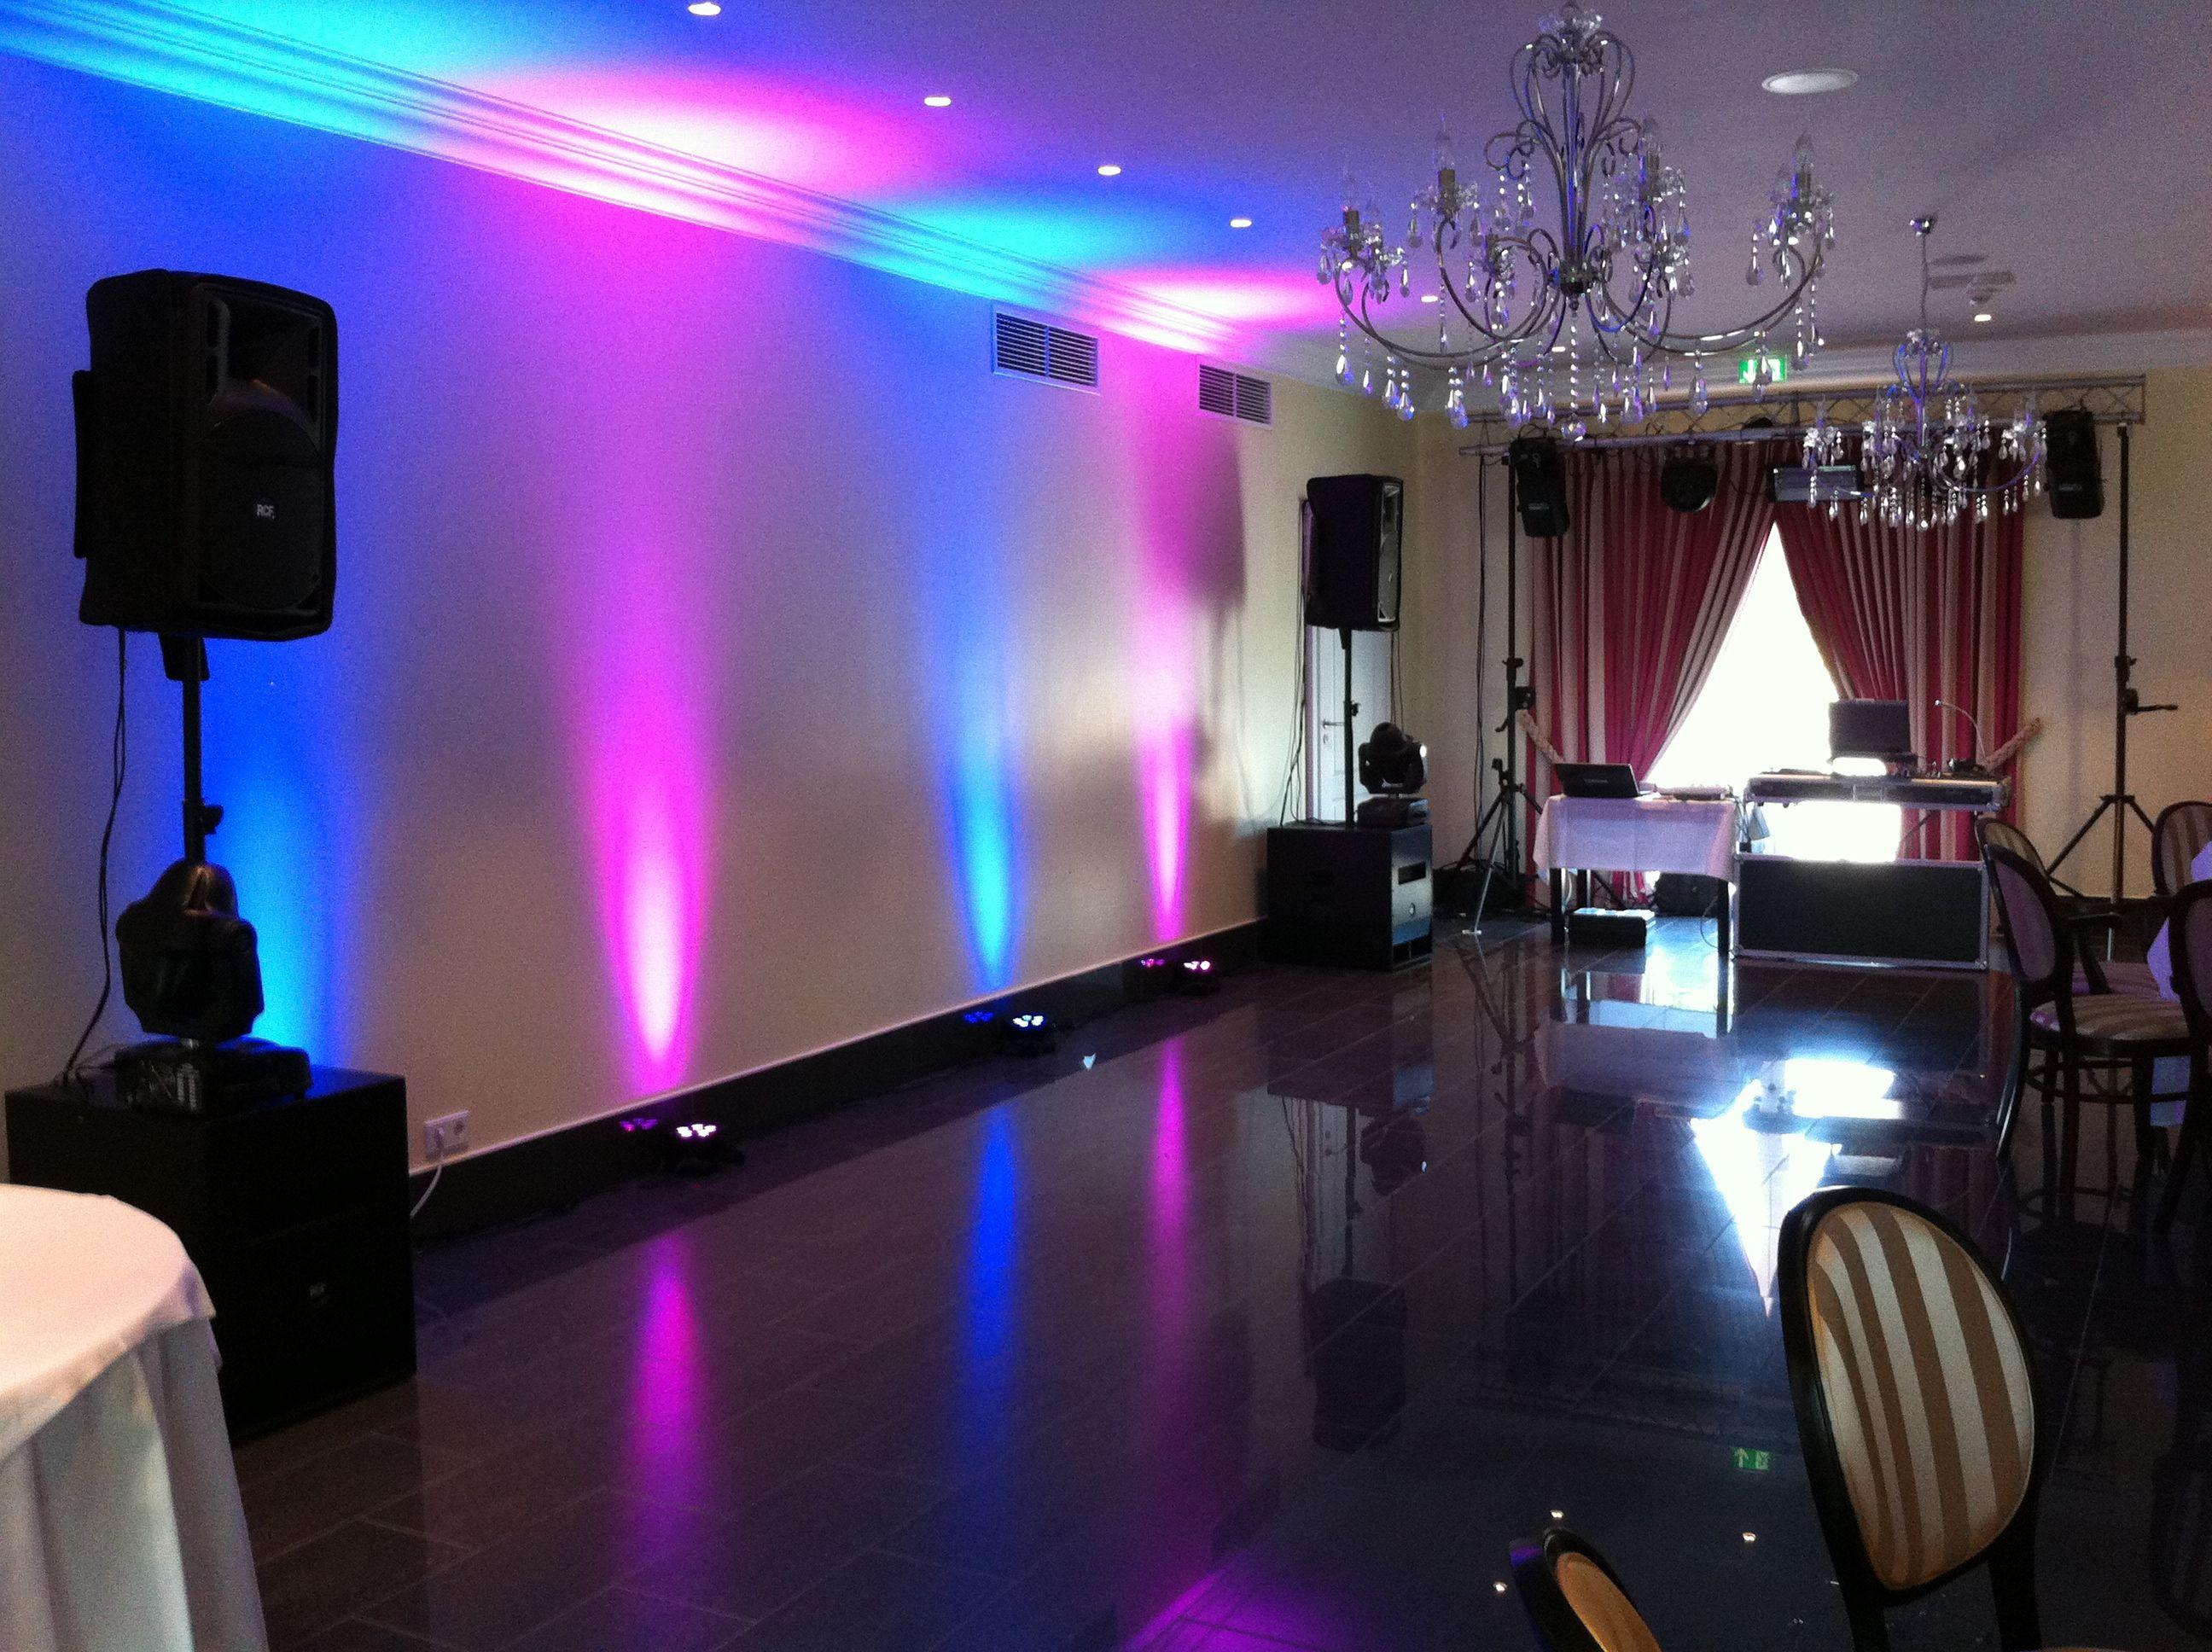 Bayrisches Landhaus Bielefeld (LED Wandbeleuchtung) Dj Team Herford